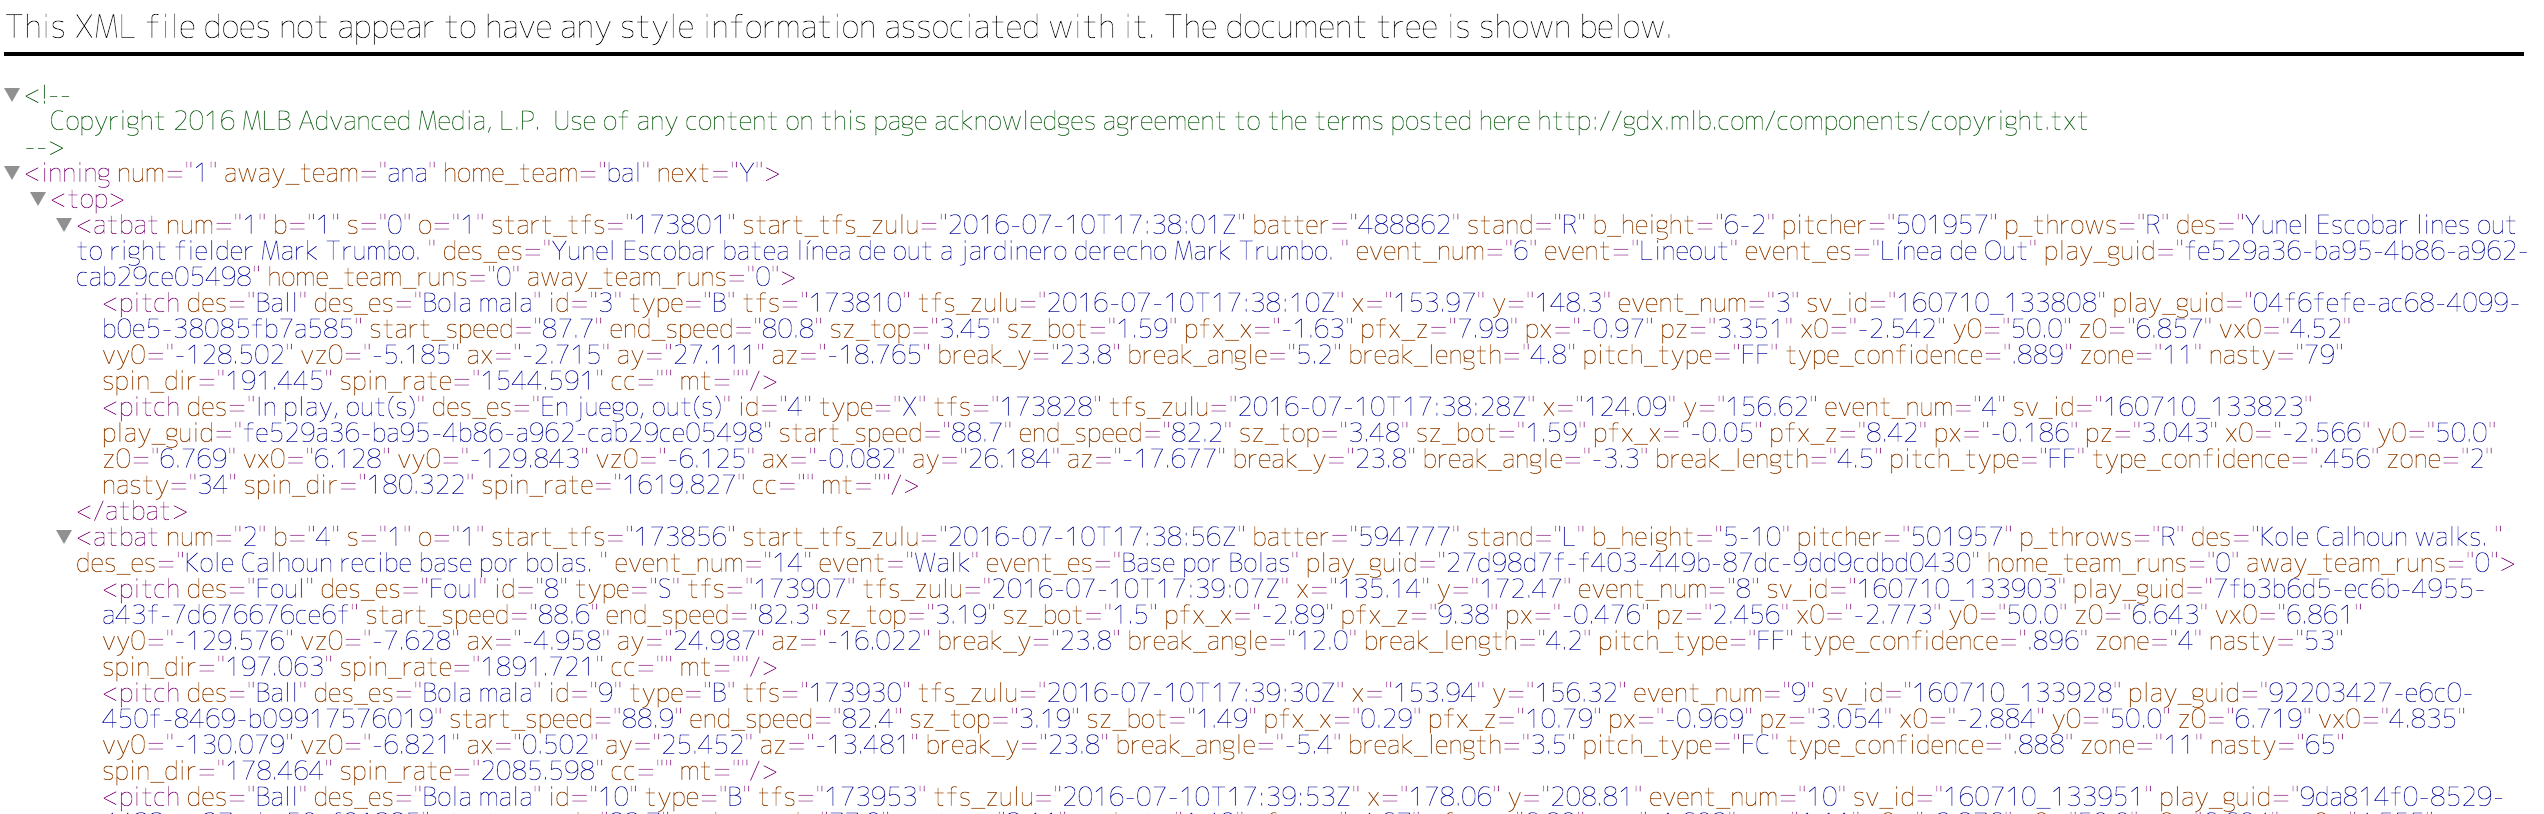 rとsqliteでmlbの一球速報データを自由気ままにいじってみた qiita